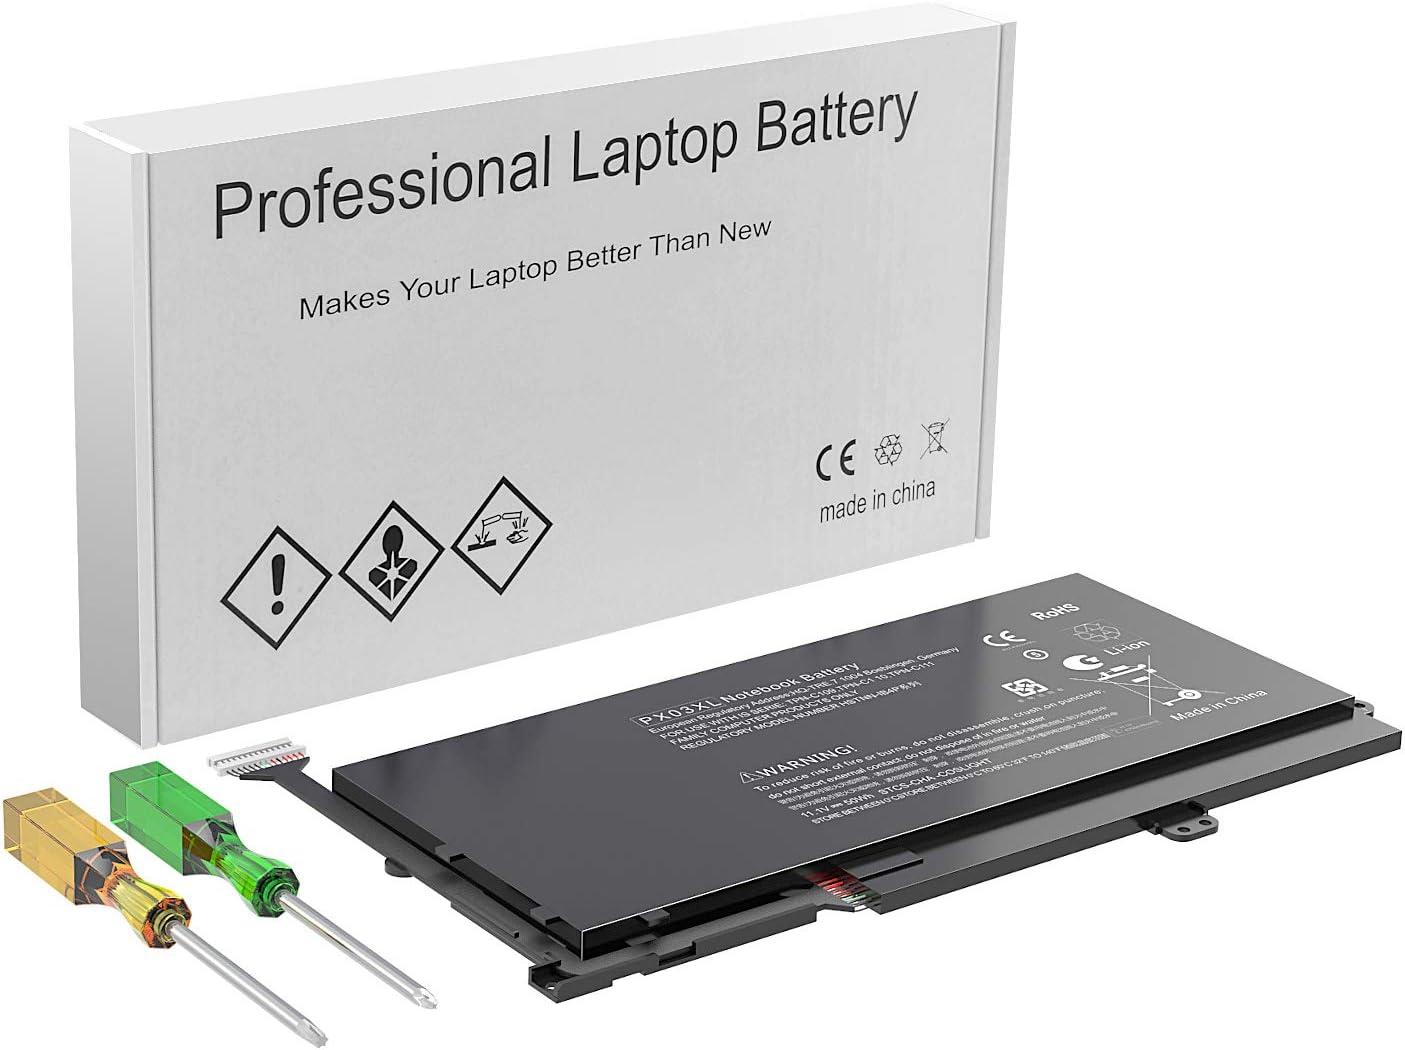 PX03XL Laptop Battery Compatible with HP Envy 14 Touchsmart M6 S